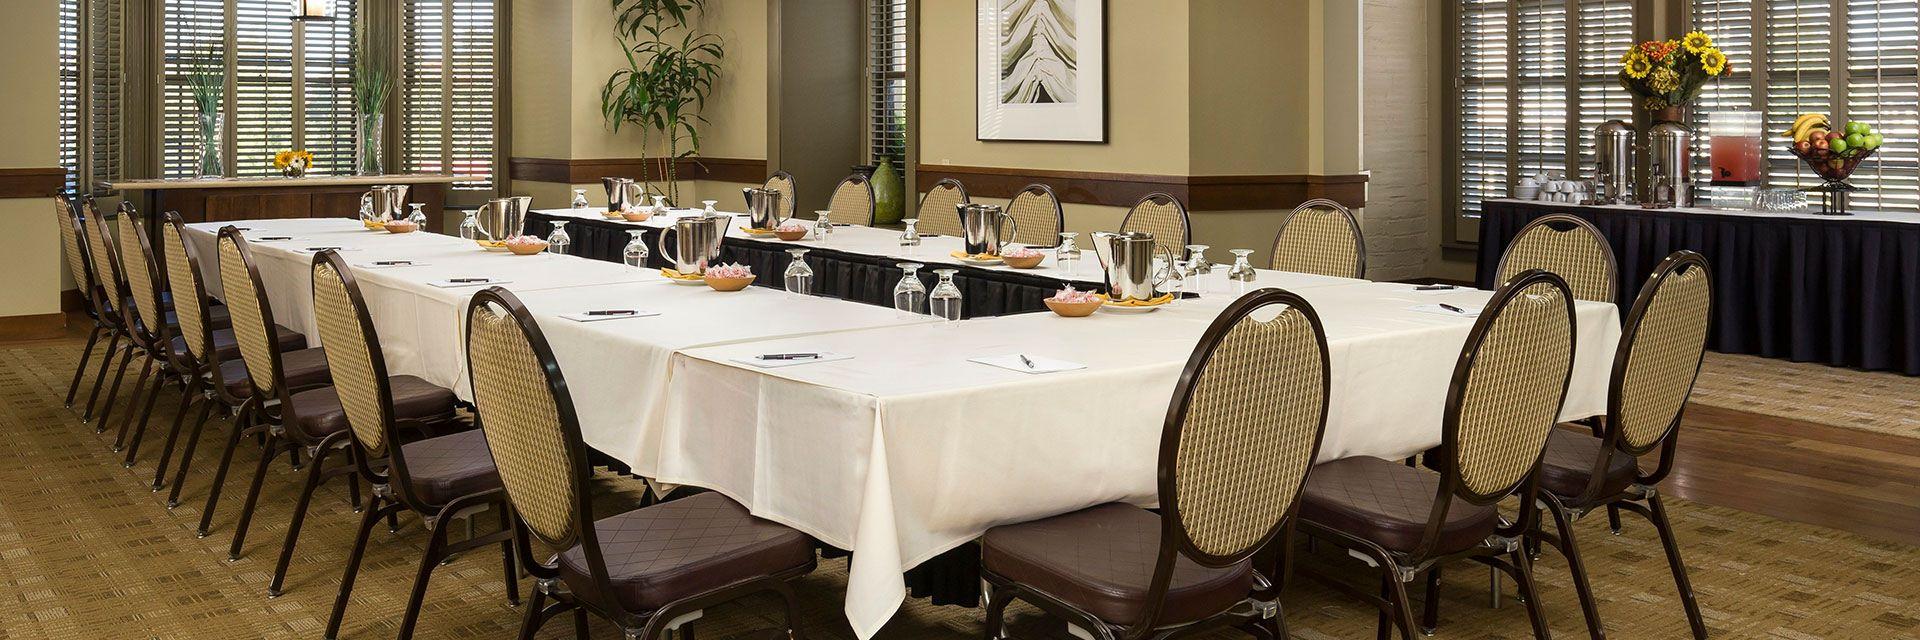 Meetings at Hotel California